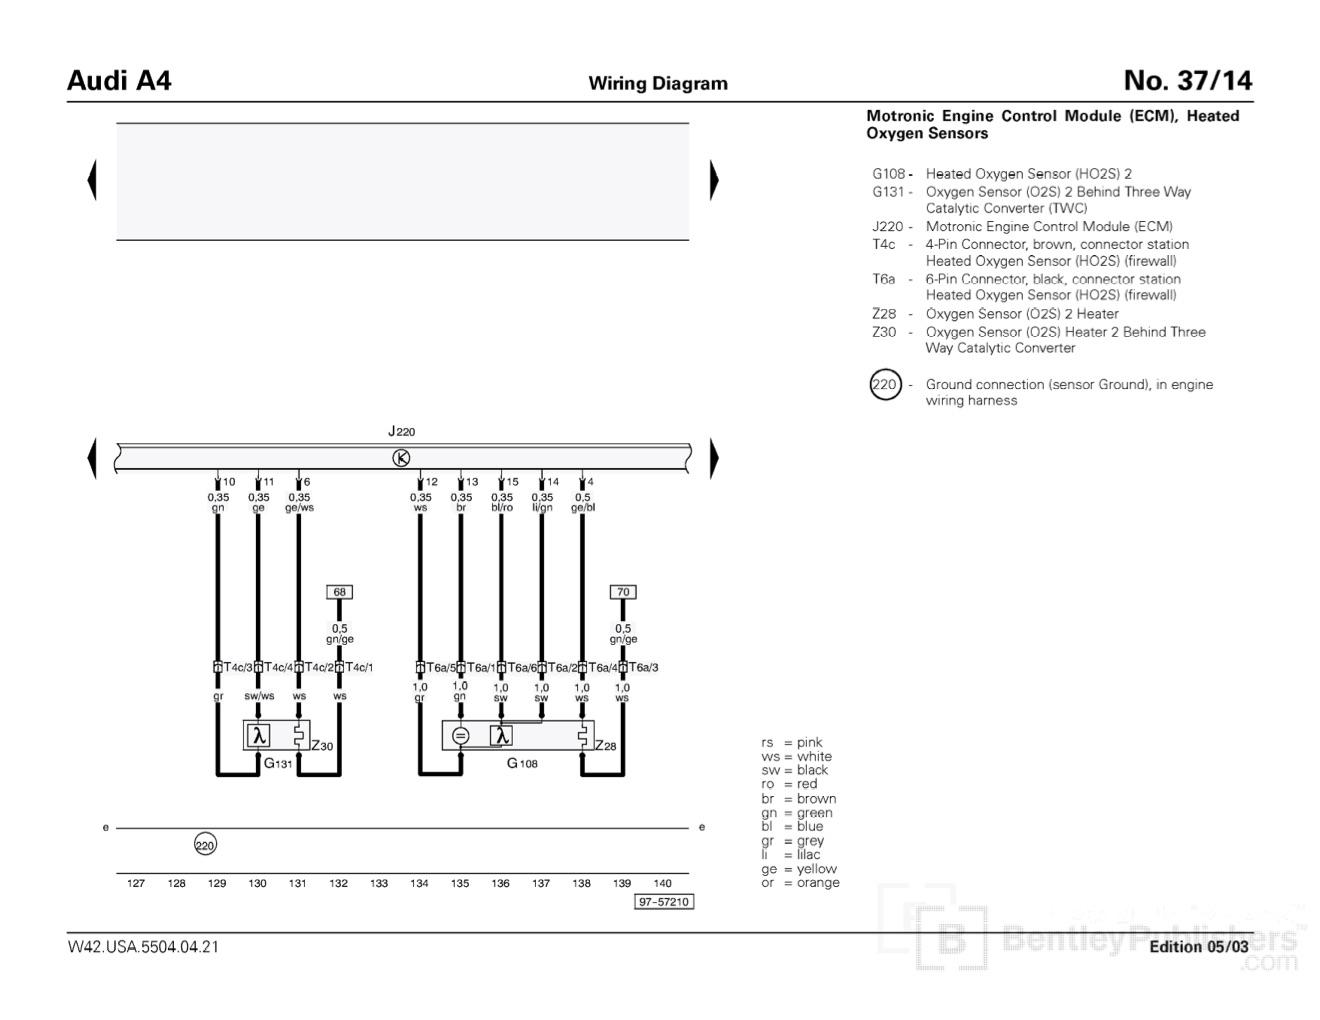 Viper Rpn471t Wiring Diagram Simple Kia Sedona Alternator Auto Electrical Audiovox Alarm Diagrams